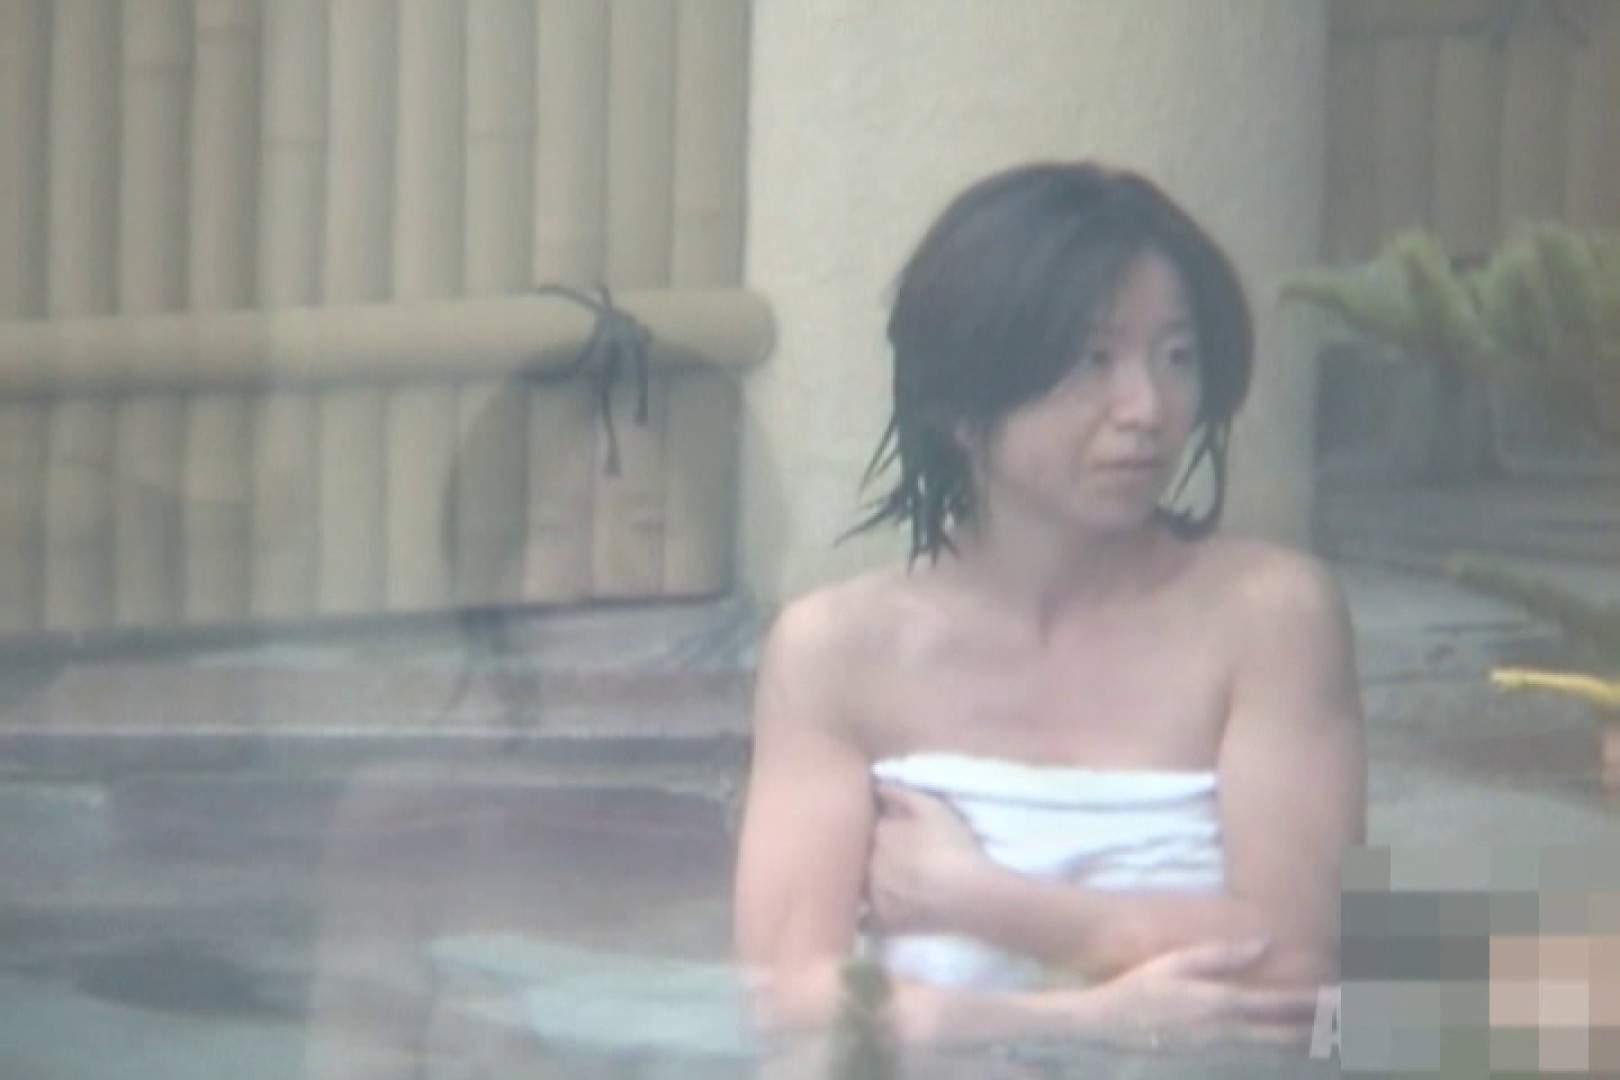 Aquaな露天風呂Vol.841 エッチな盗撮 ぱこり動画紹介 86pic 86